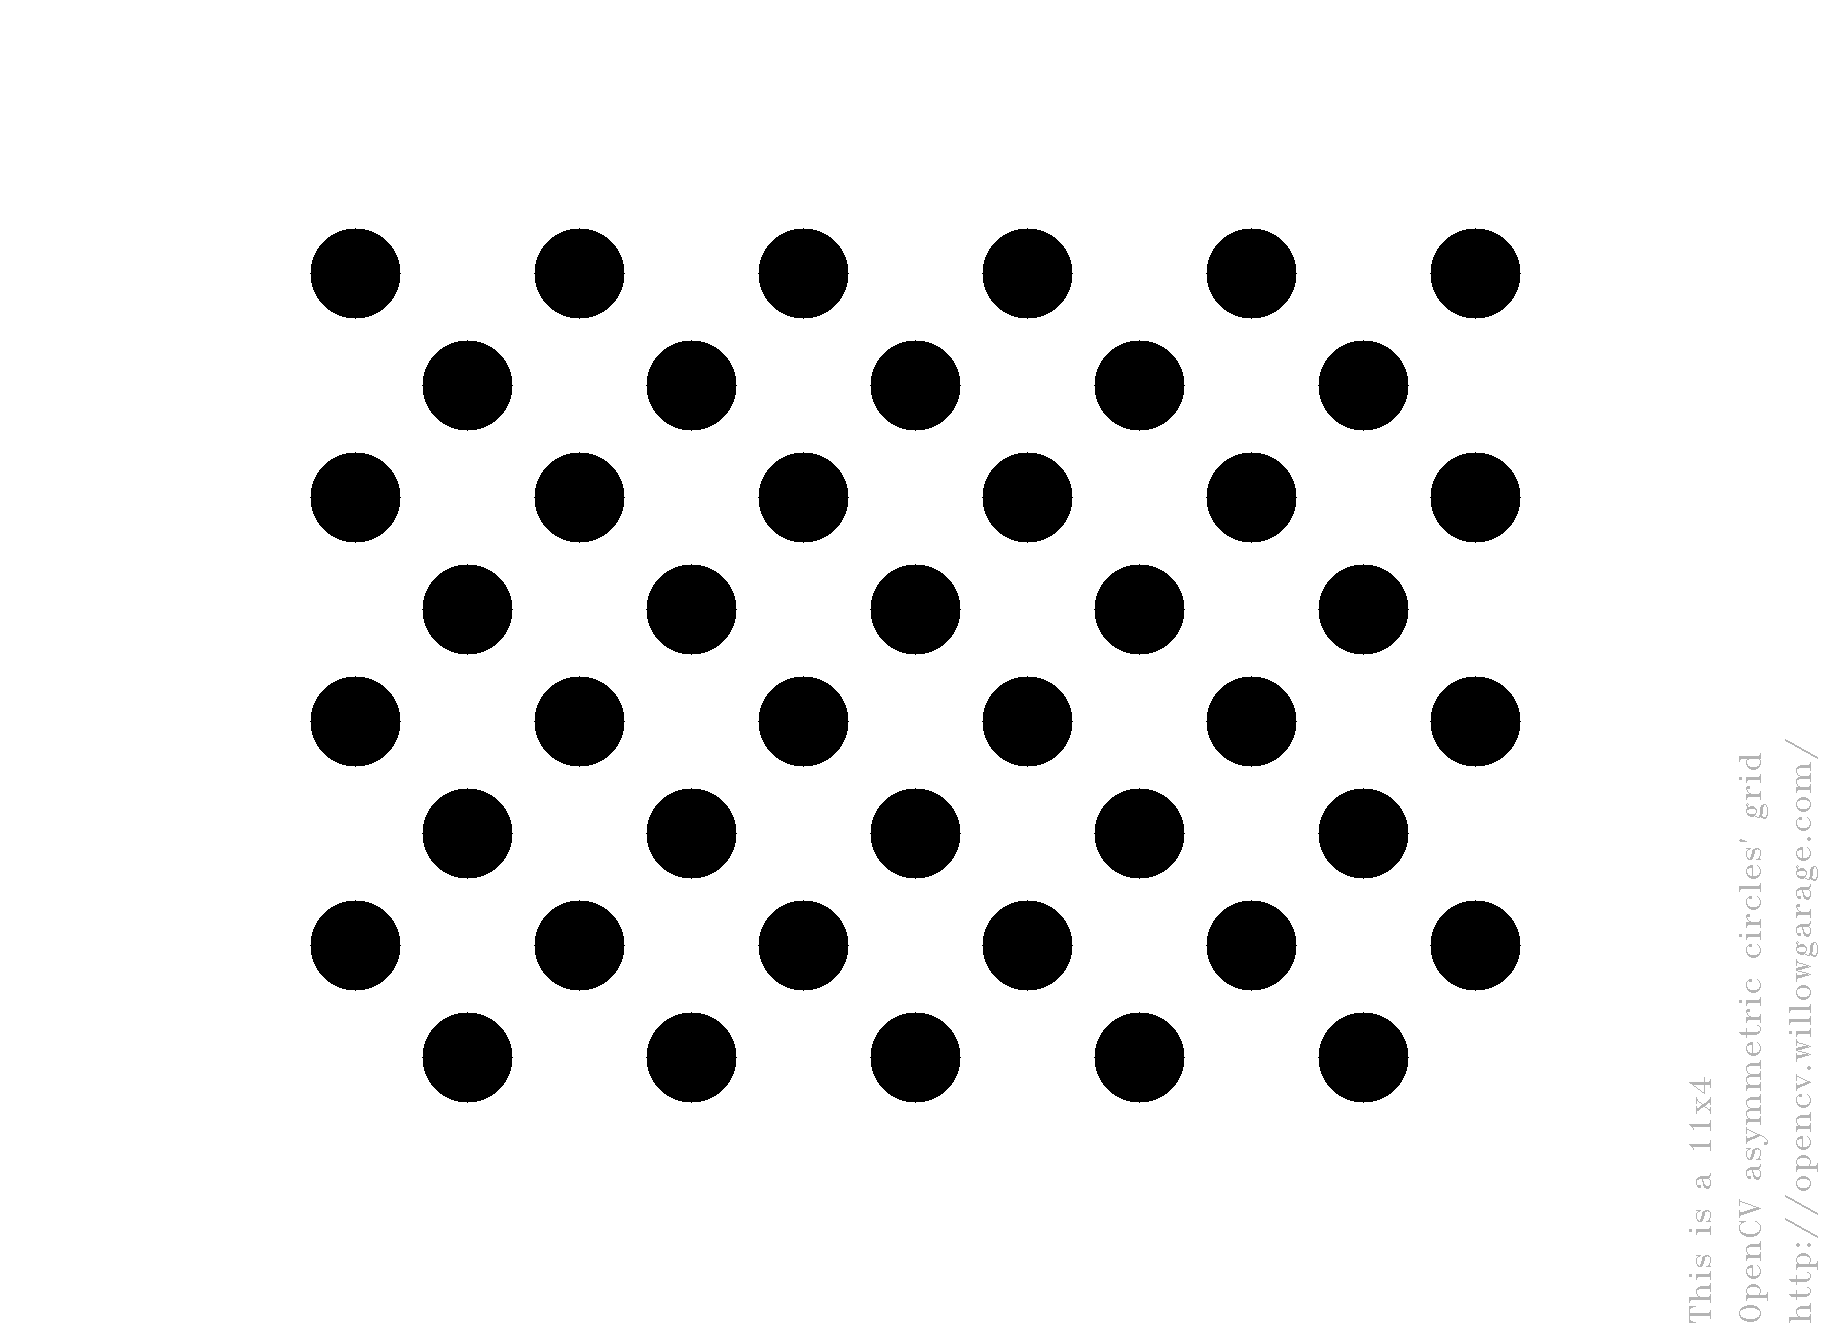 Acircles pattern